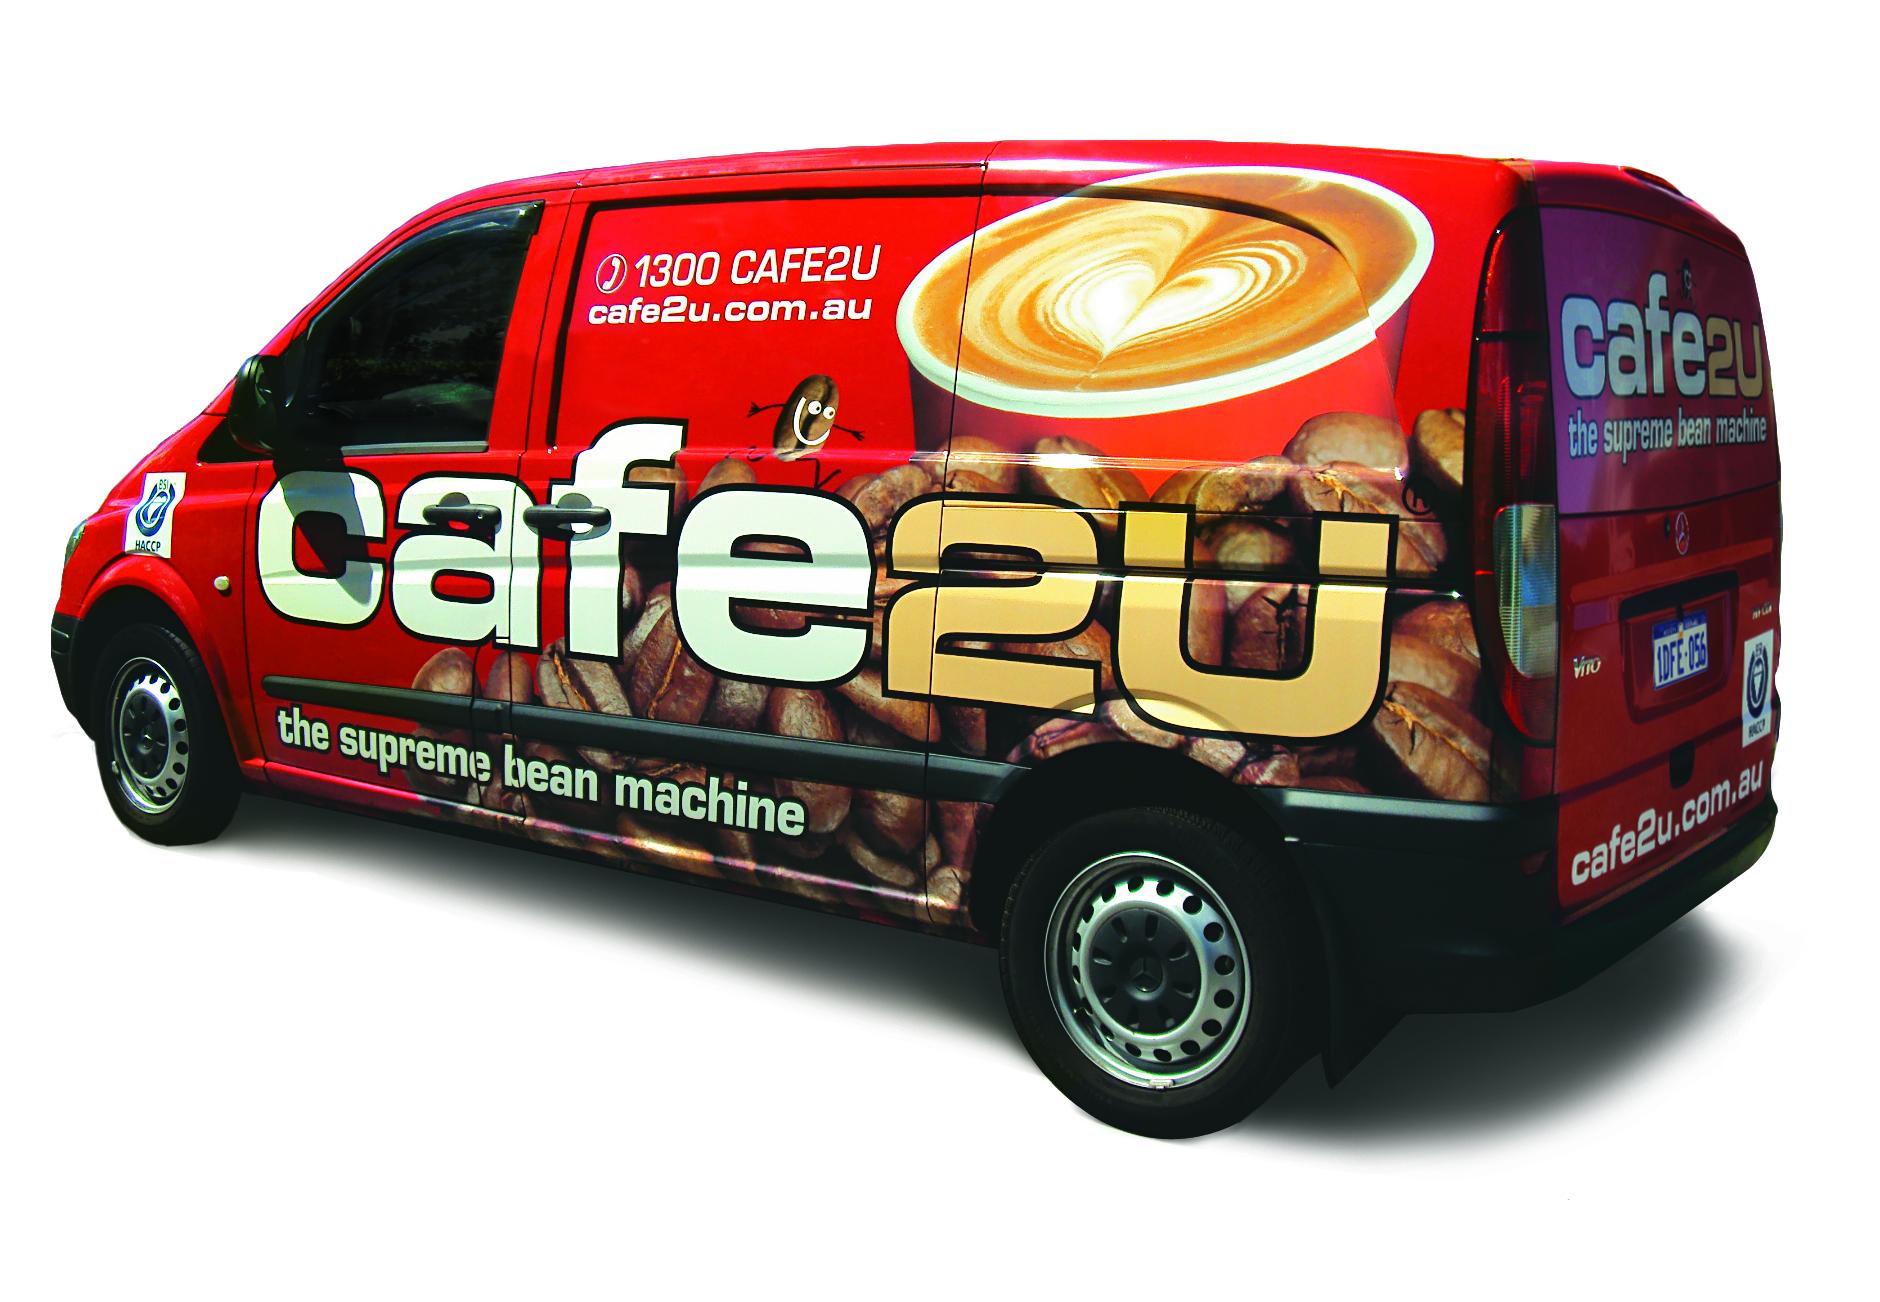 cafe2u-established-mobile-coffee-franchise-now-available-in-regency-park-sa-3